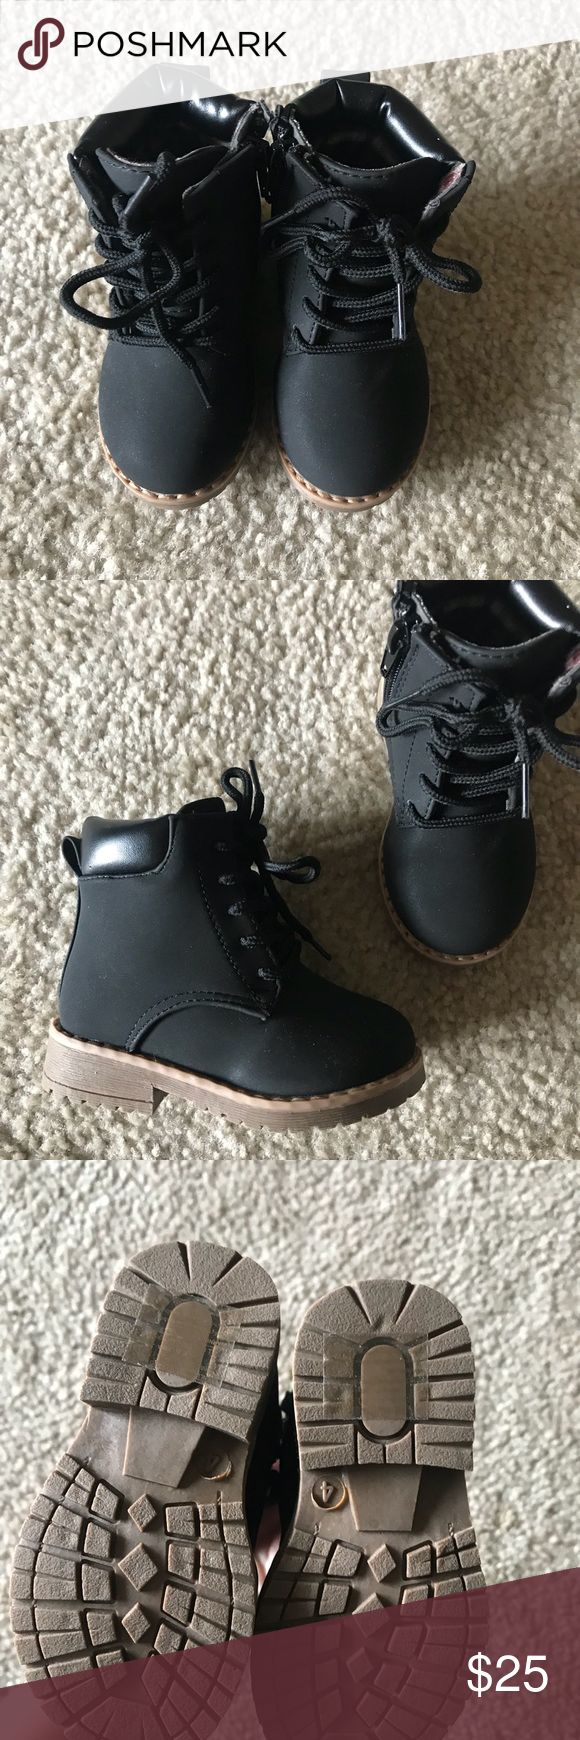 Infant black boots Infants black boots